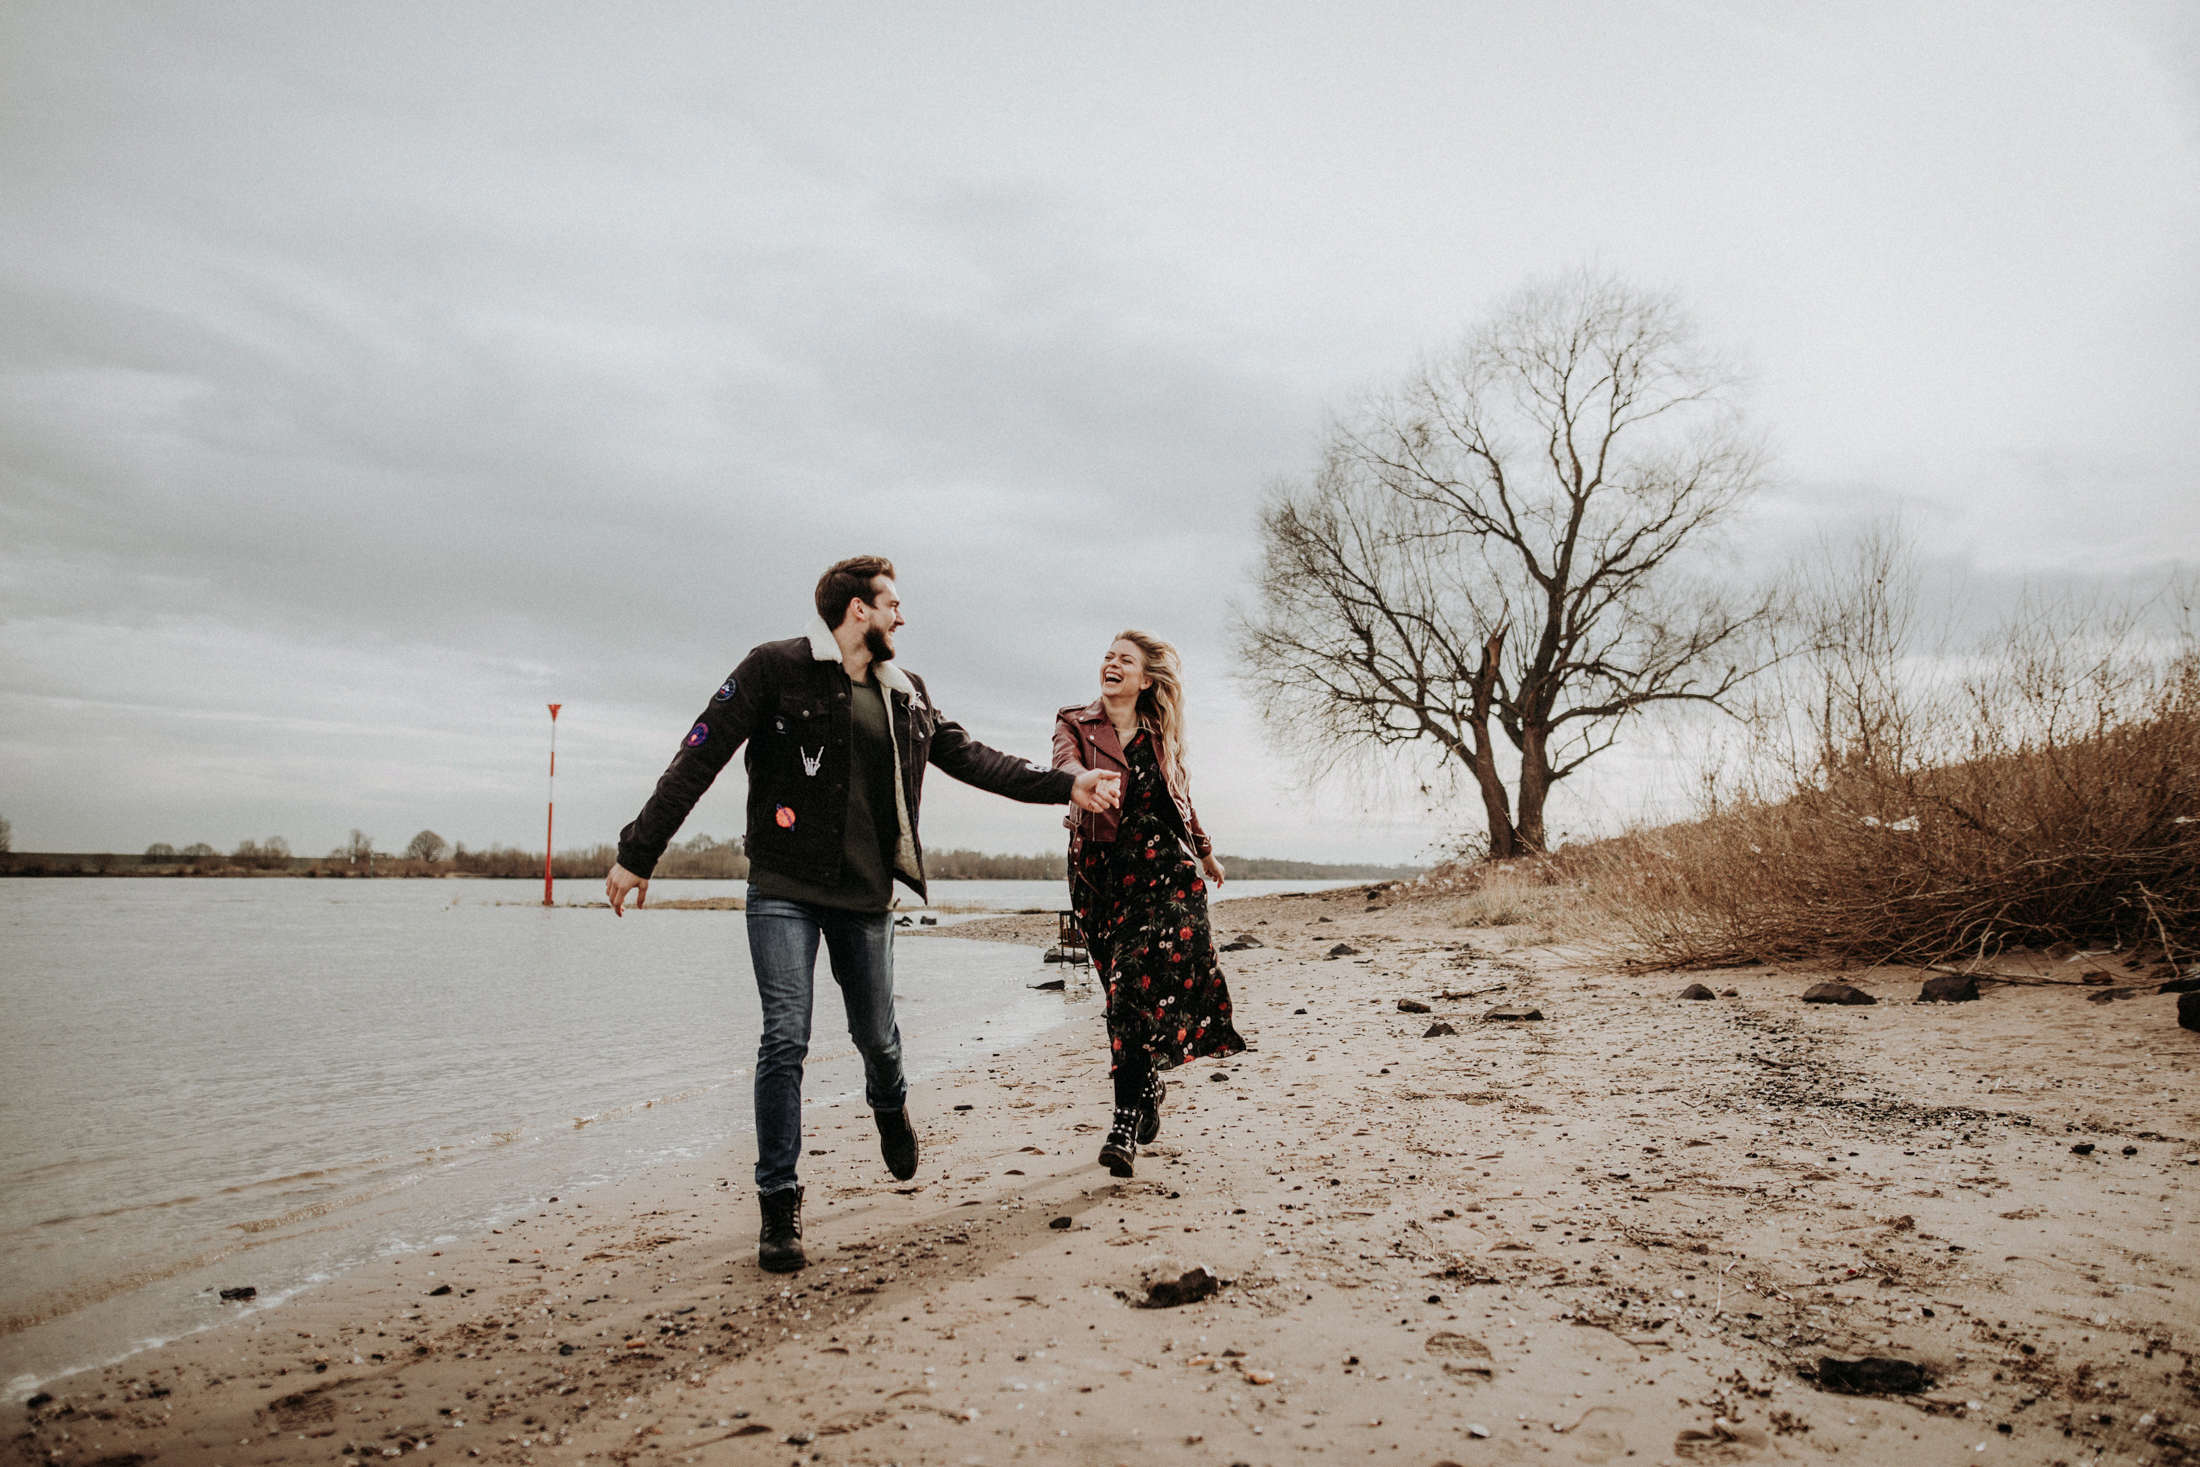 Wedding_Photographer_Mallorca_DanielaMarquardt_Photography_CanaryIslands_Lanzarote_Iceland_Tuscany_Santorini_Portugal_NewYork_Spain_Elopement_Hochzeitsfotograf_CK16